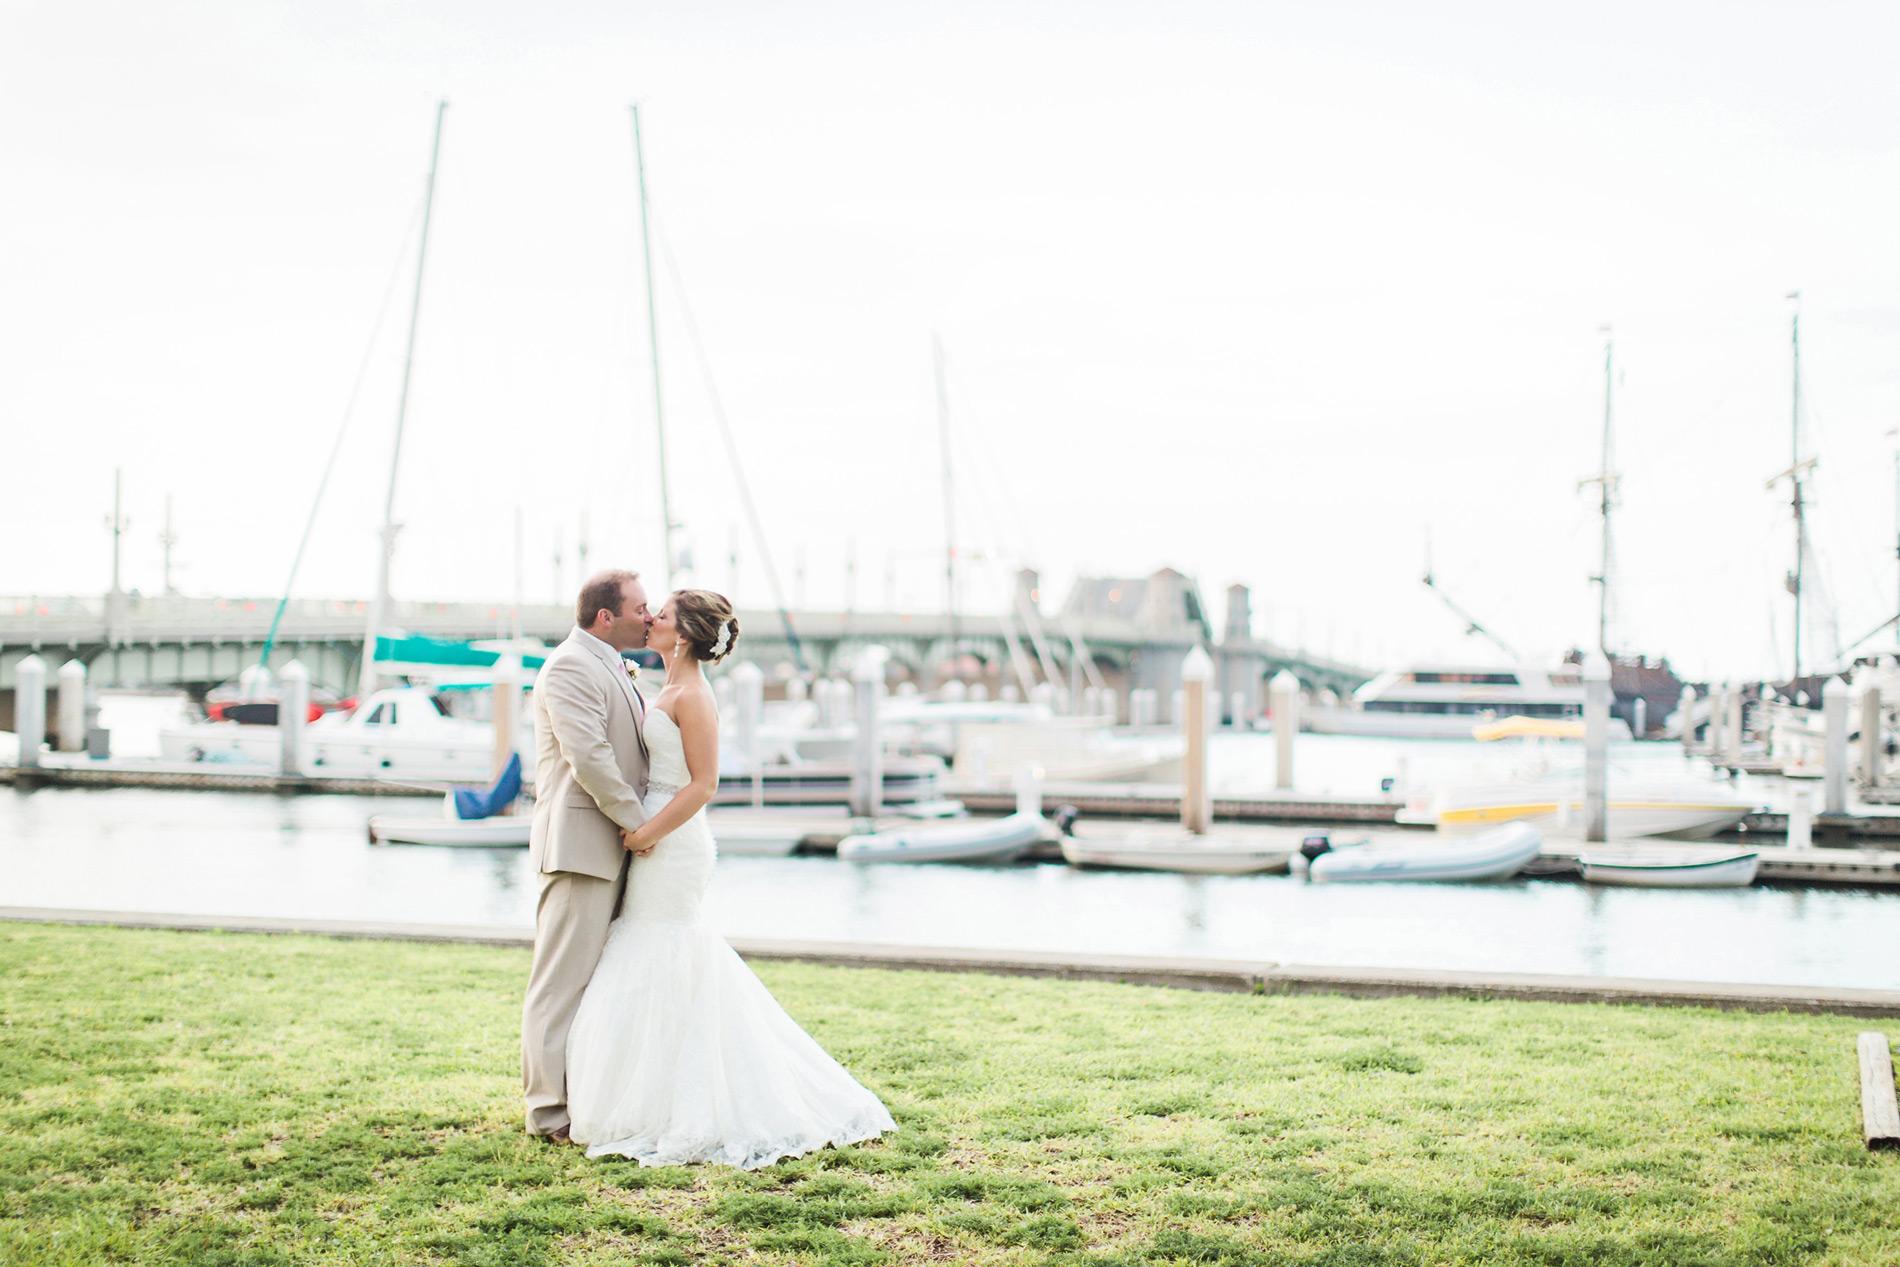 st-augustine-bayfront-bride-and-groom